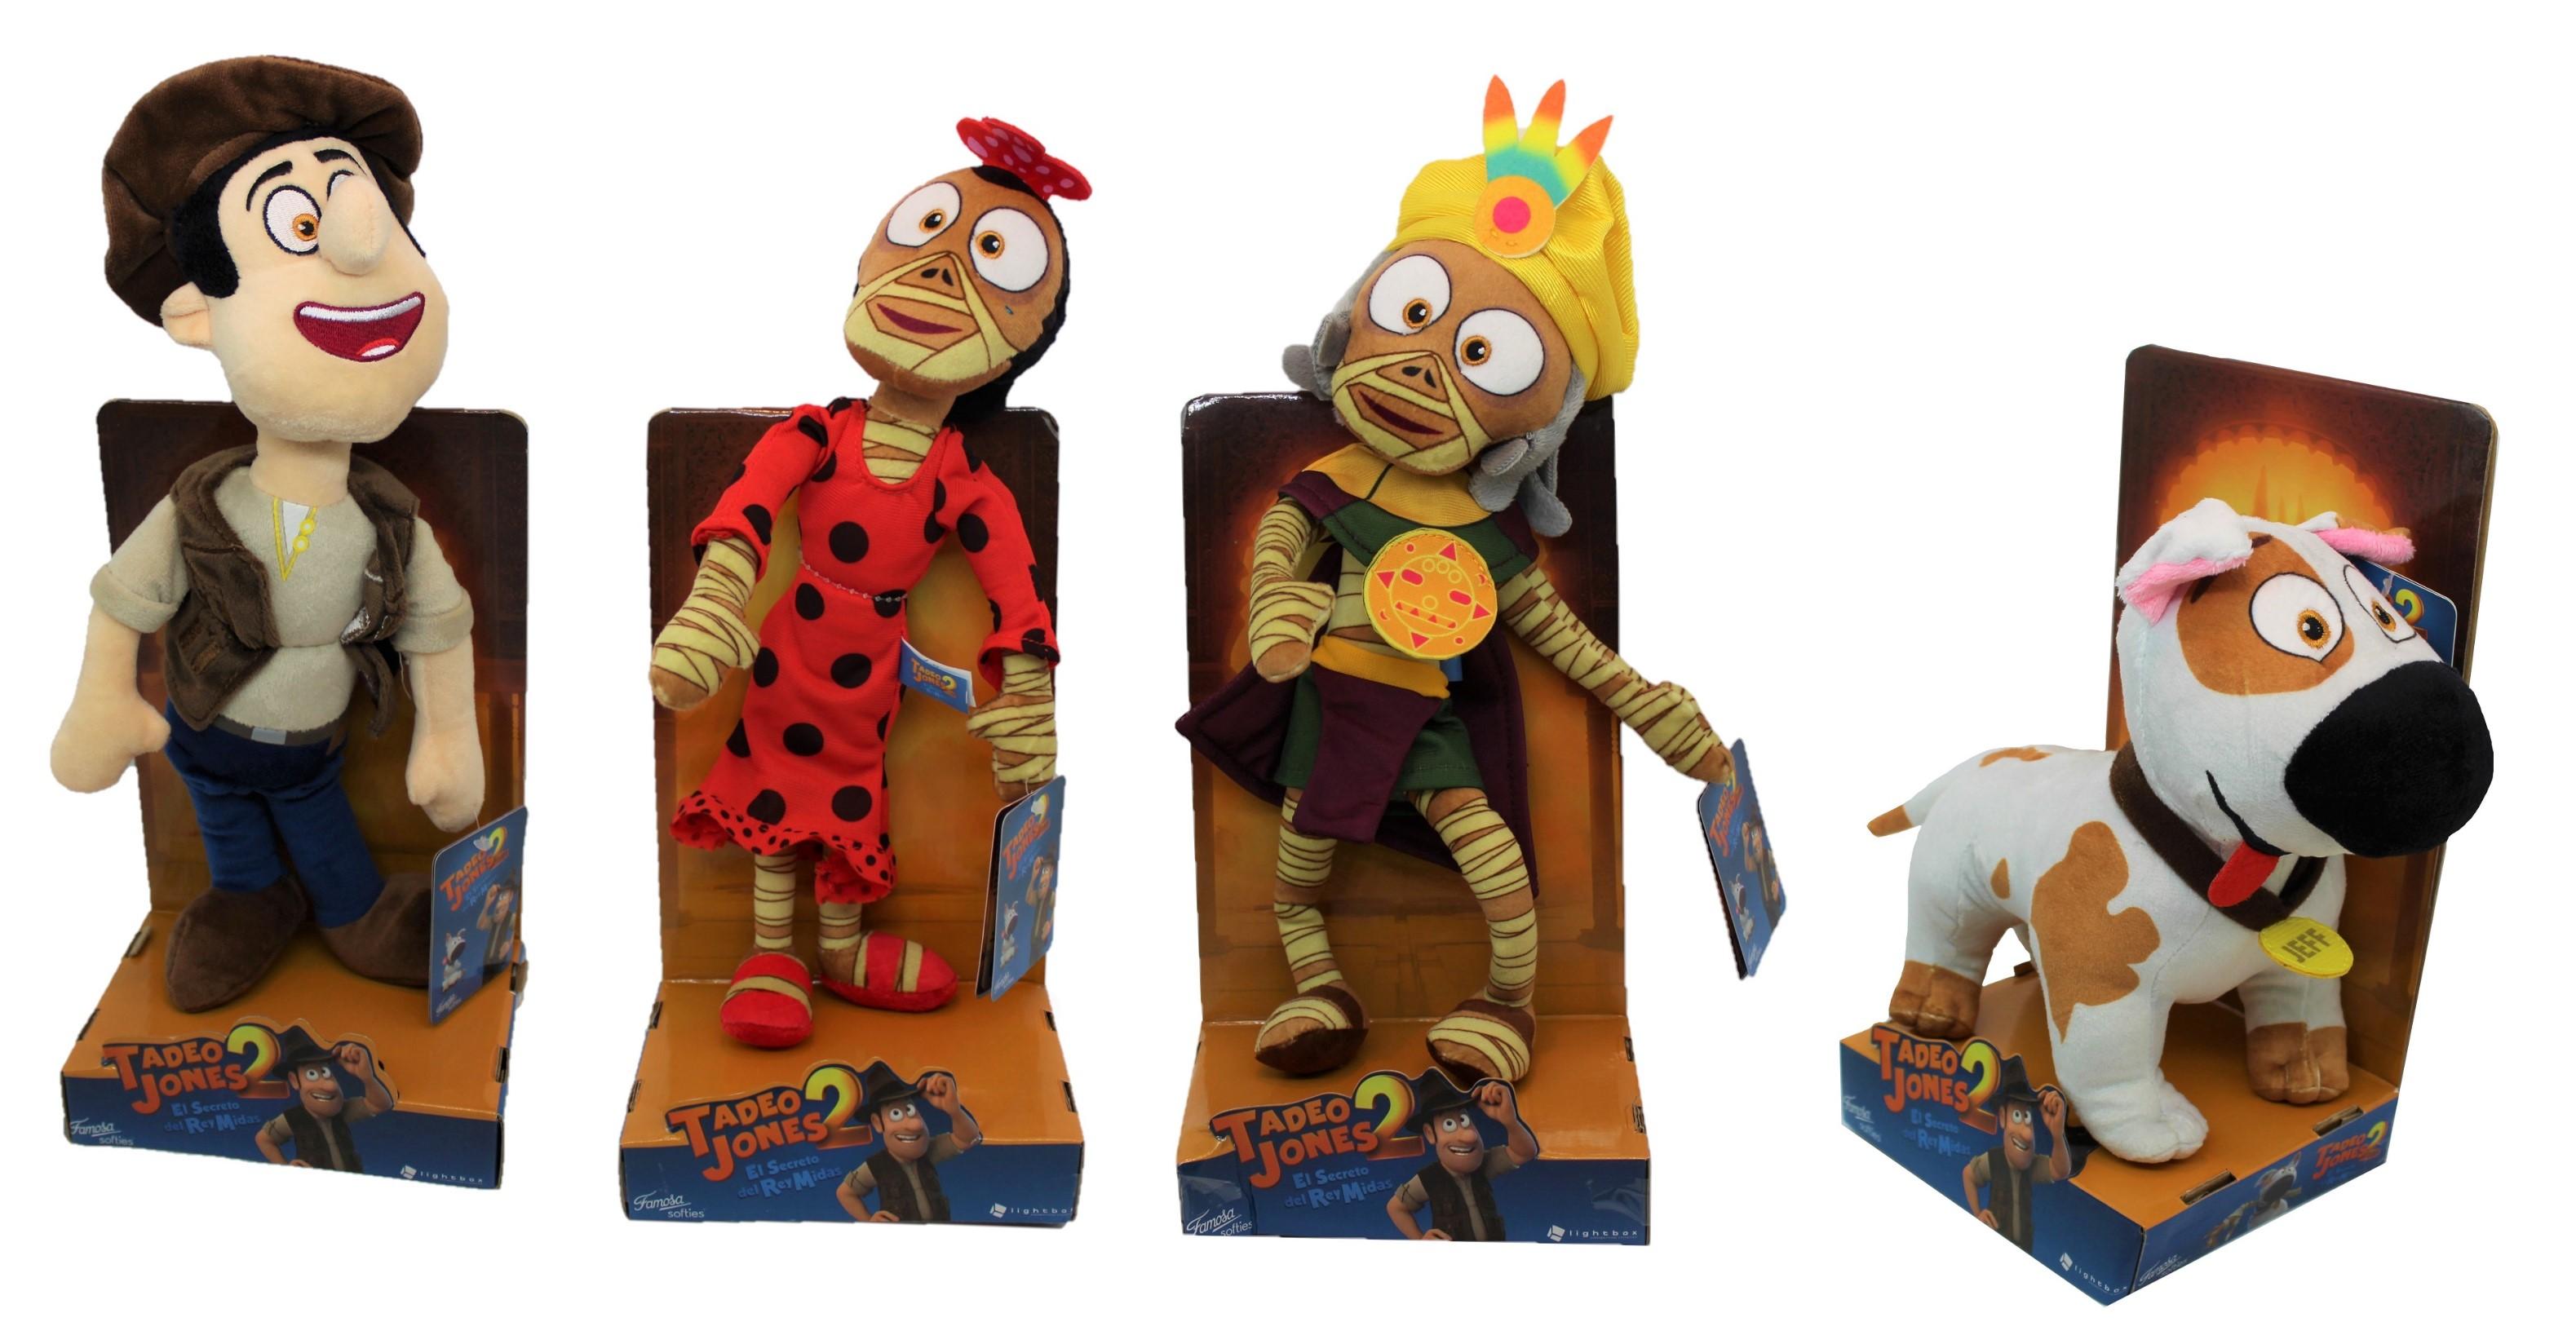 Famosa Tadeo Jones 2 verschiedene Plüschfiguren (Auswahl)